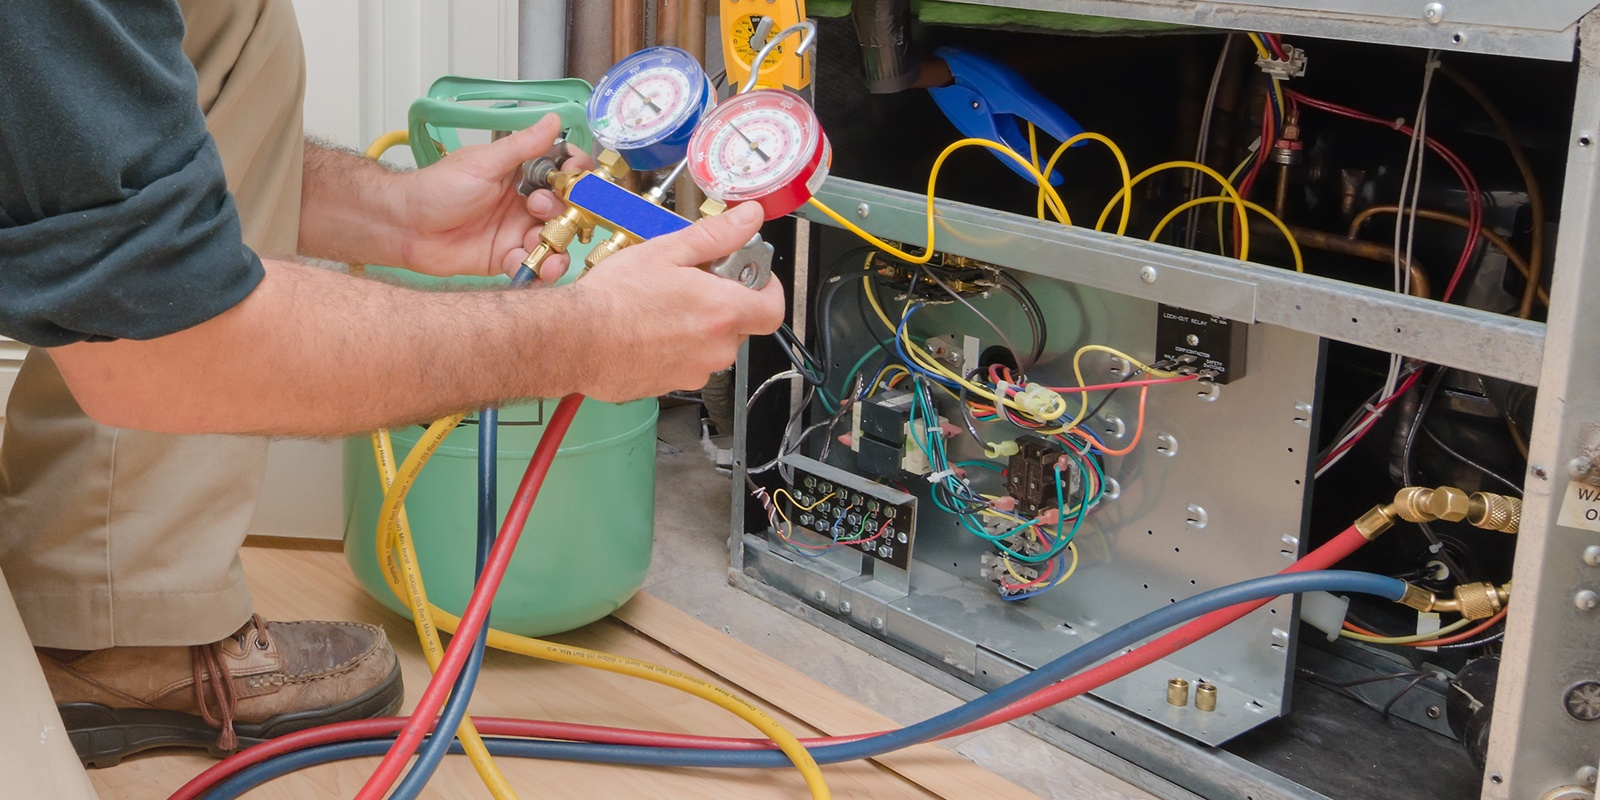 TDI-blog-header-HVAC Risks to Keep in Mind as Summer Heat Begins-REV1